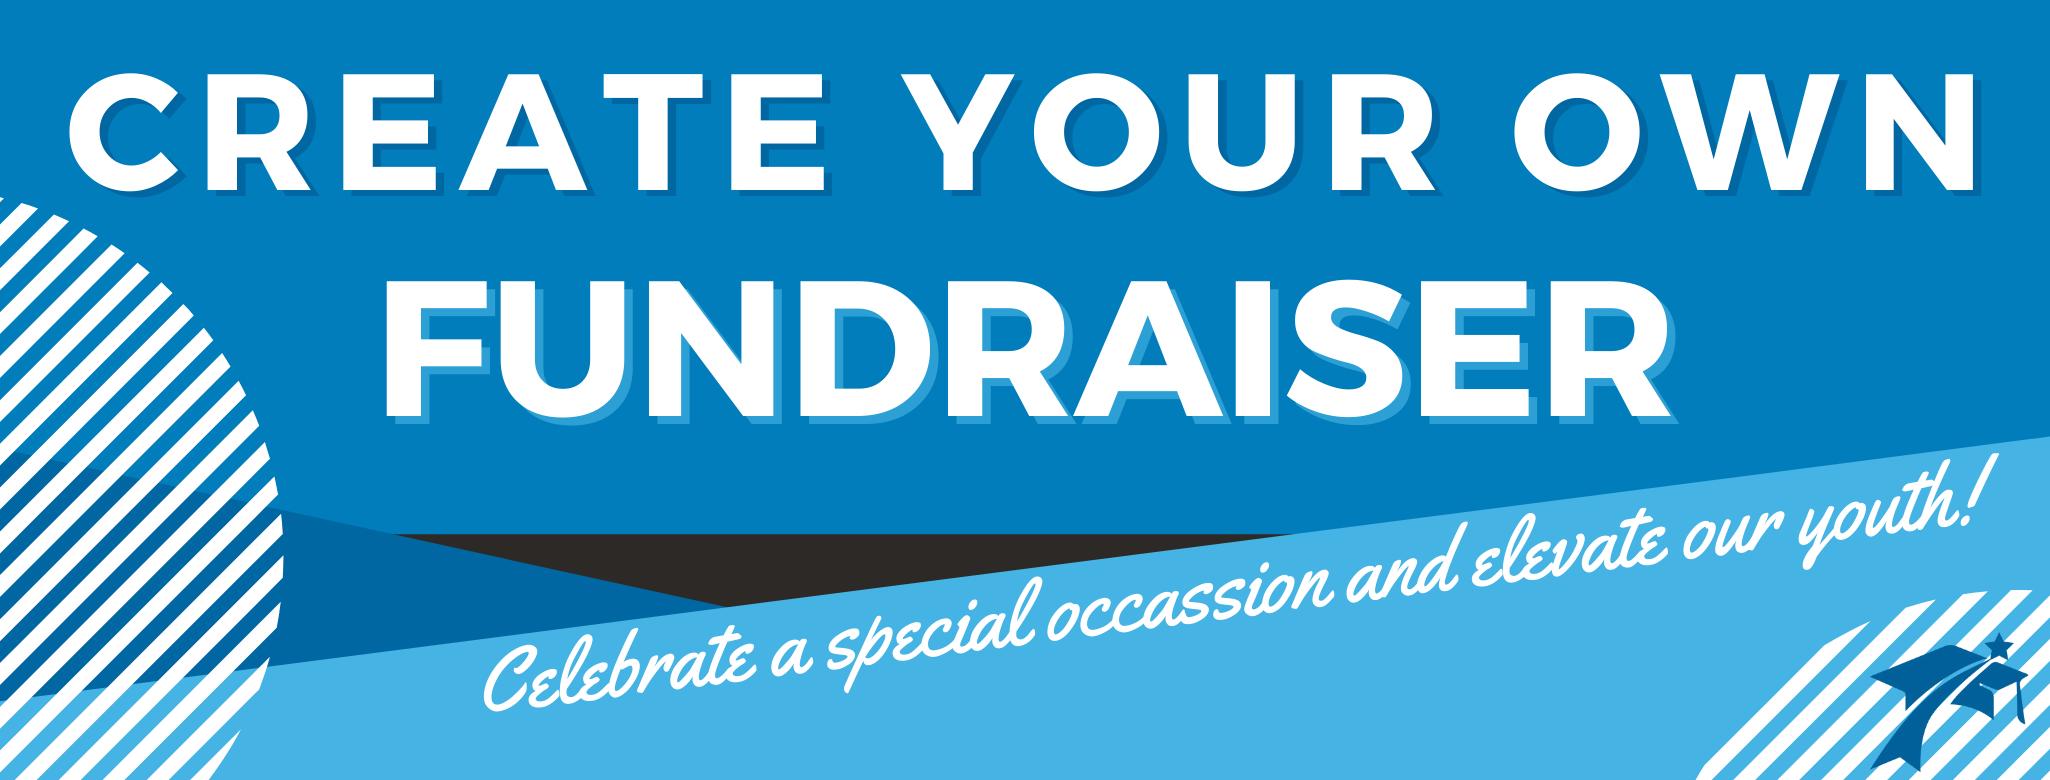 Create Your Own Fundraiser, EAHS Foundation